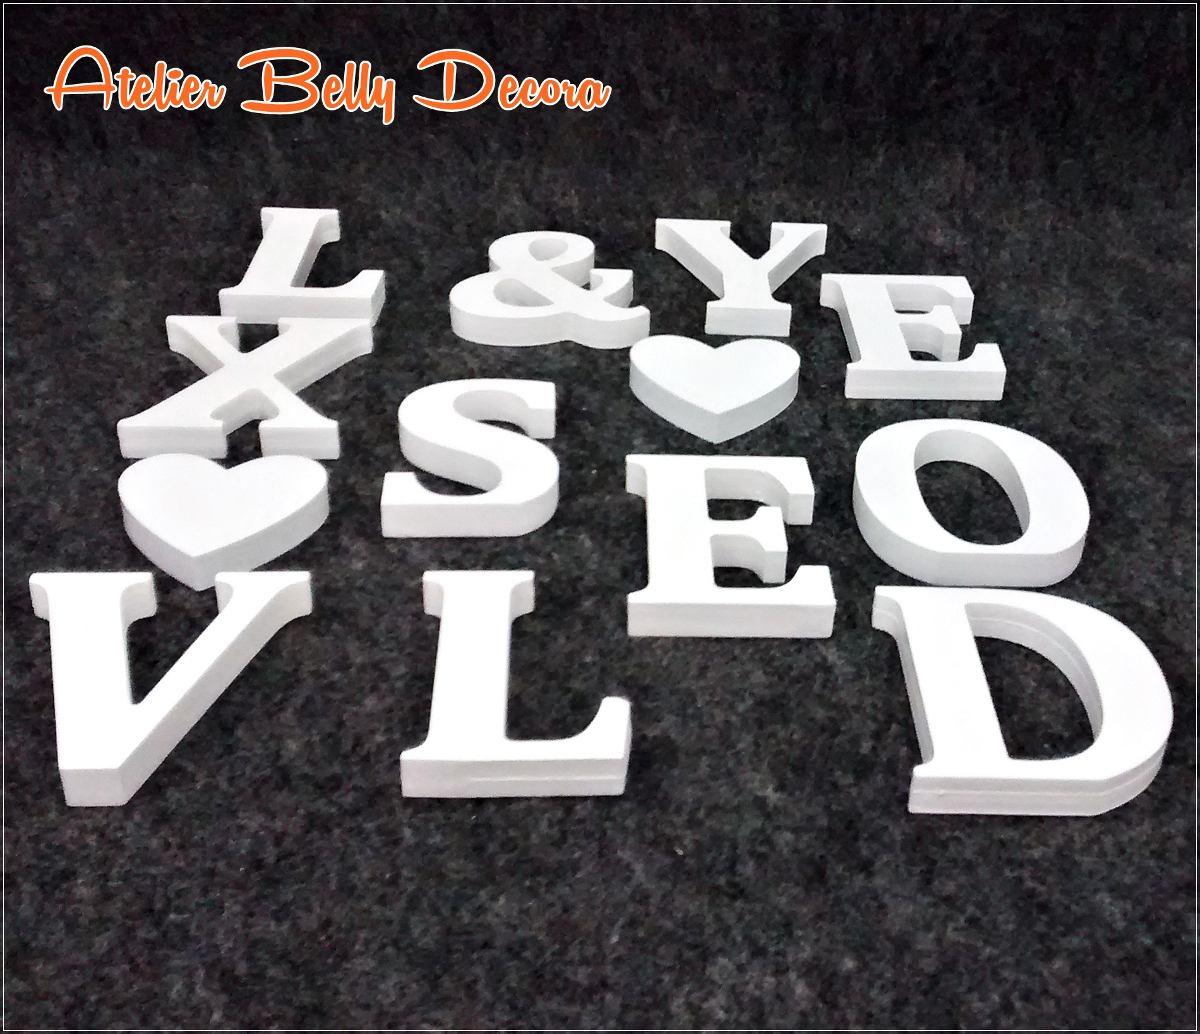 Promo o letras decorativas mdf pintado festa anivers rio - Letras decorativas pared ...